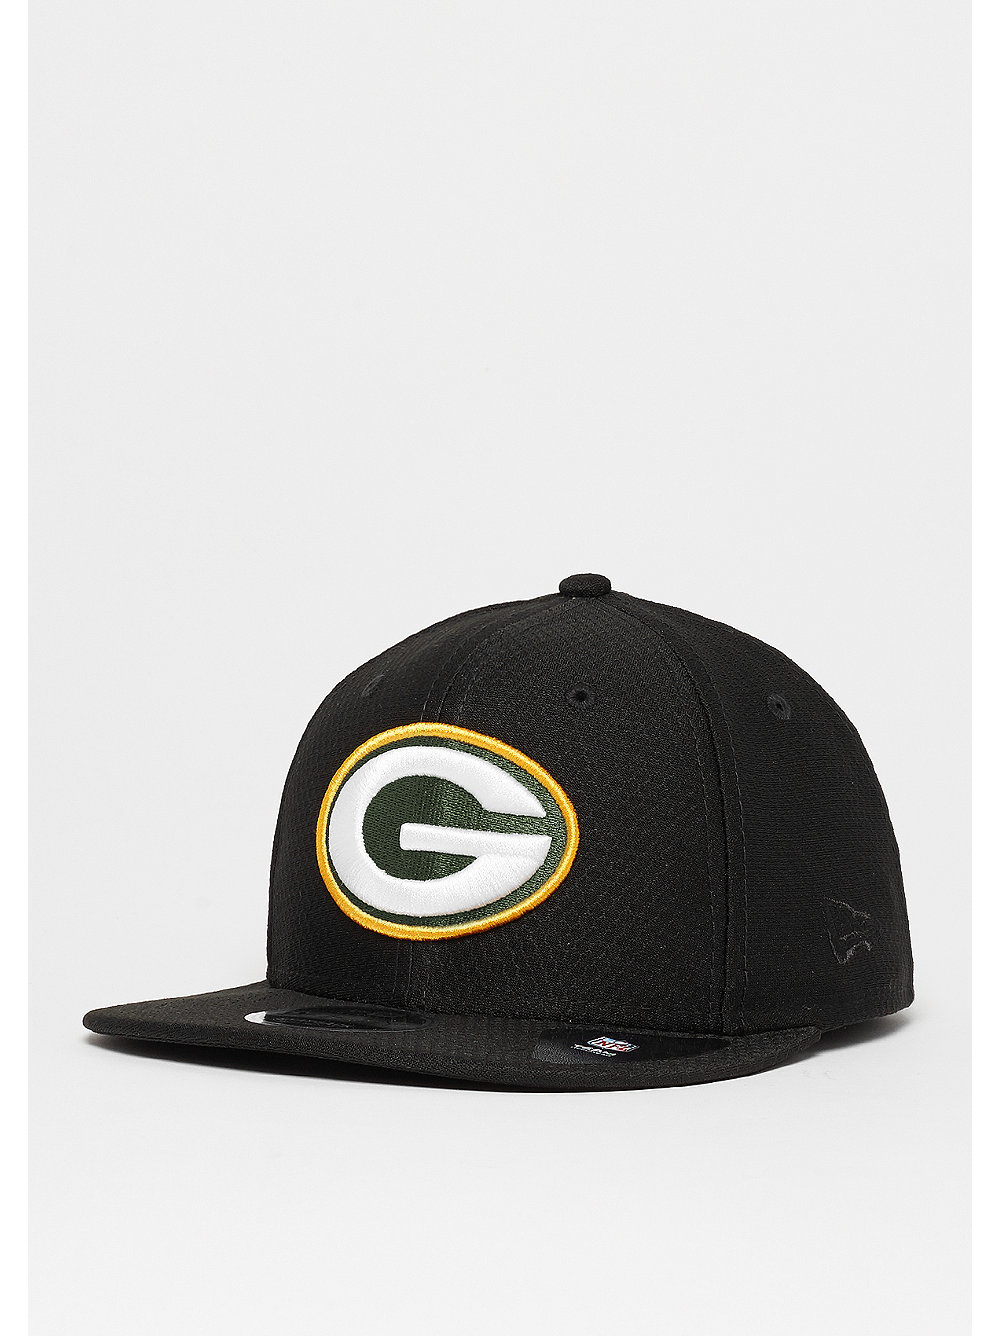 online retailer 1102e d0416 ... snapback hat be00c e25f0  coupon code for new era 9fifty nfl green bay  packers dryera tech black otc c5d75 03c84